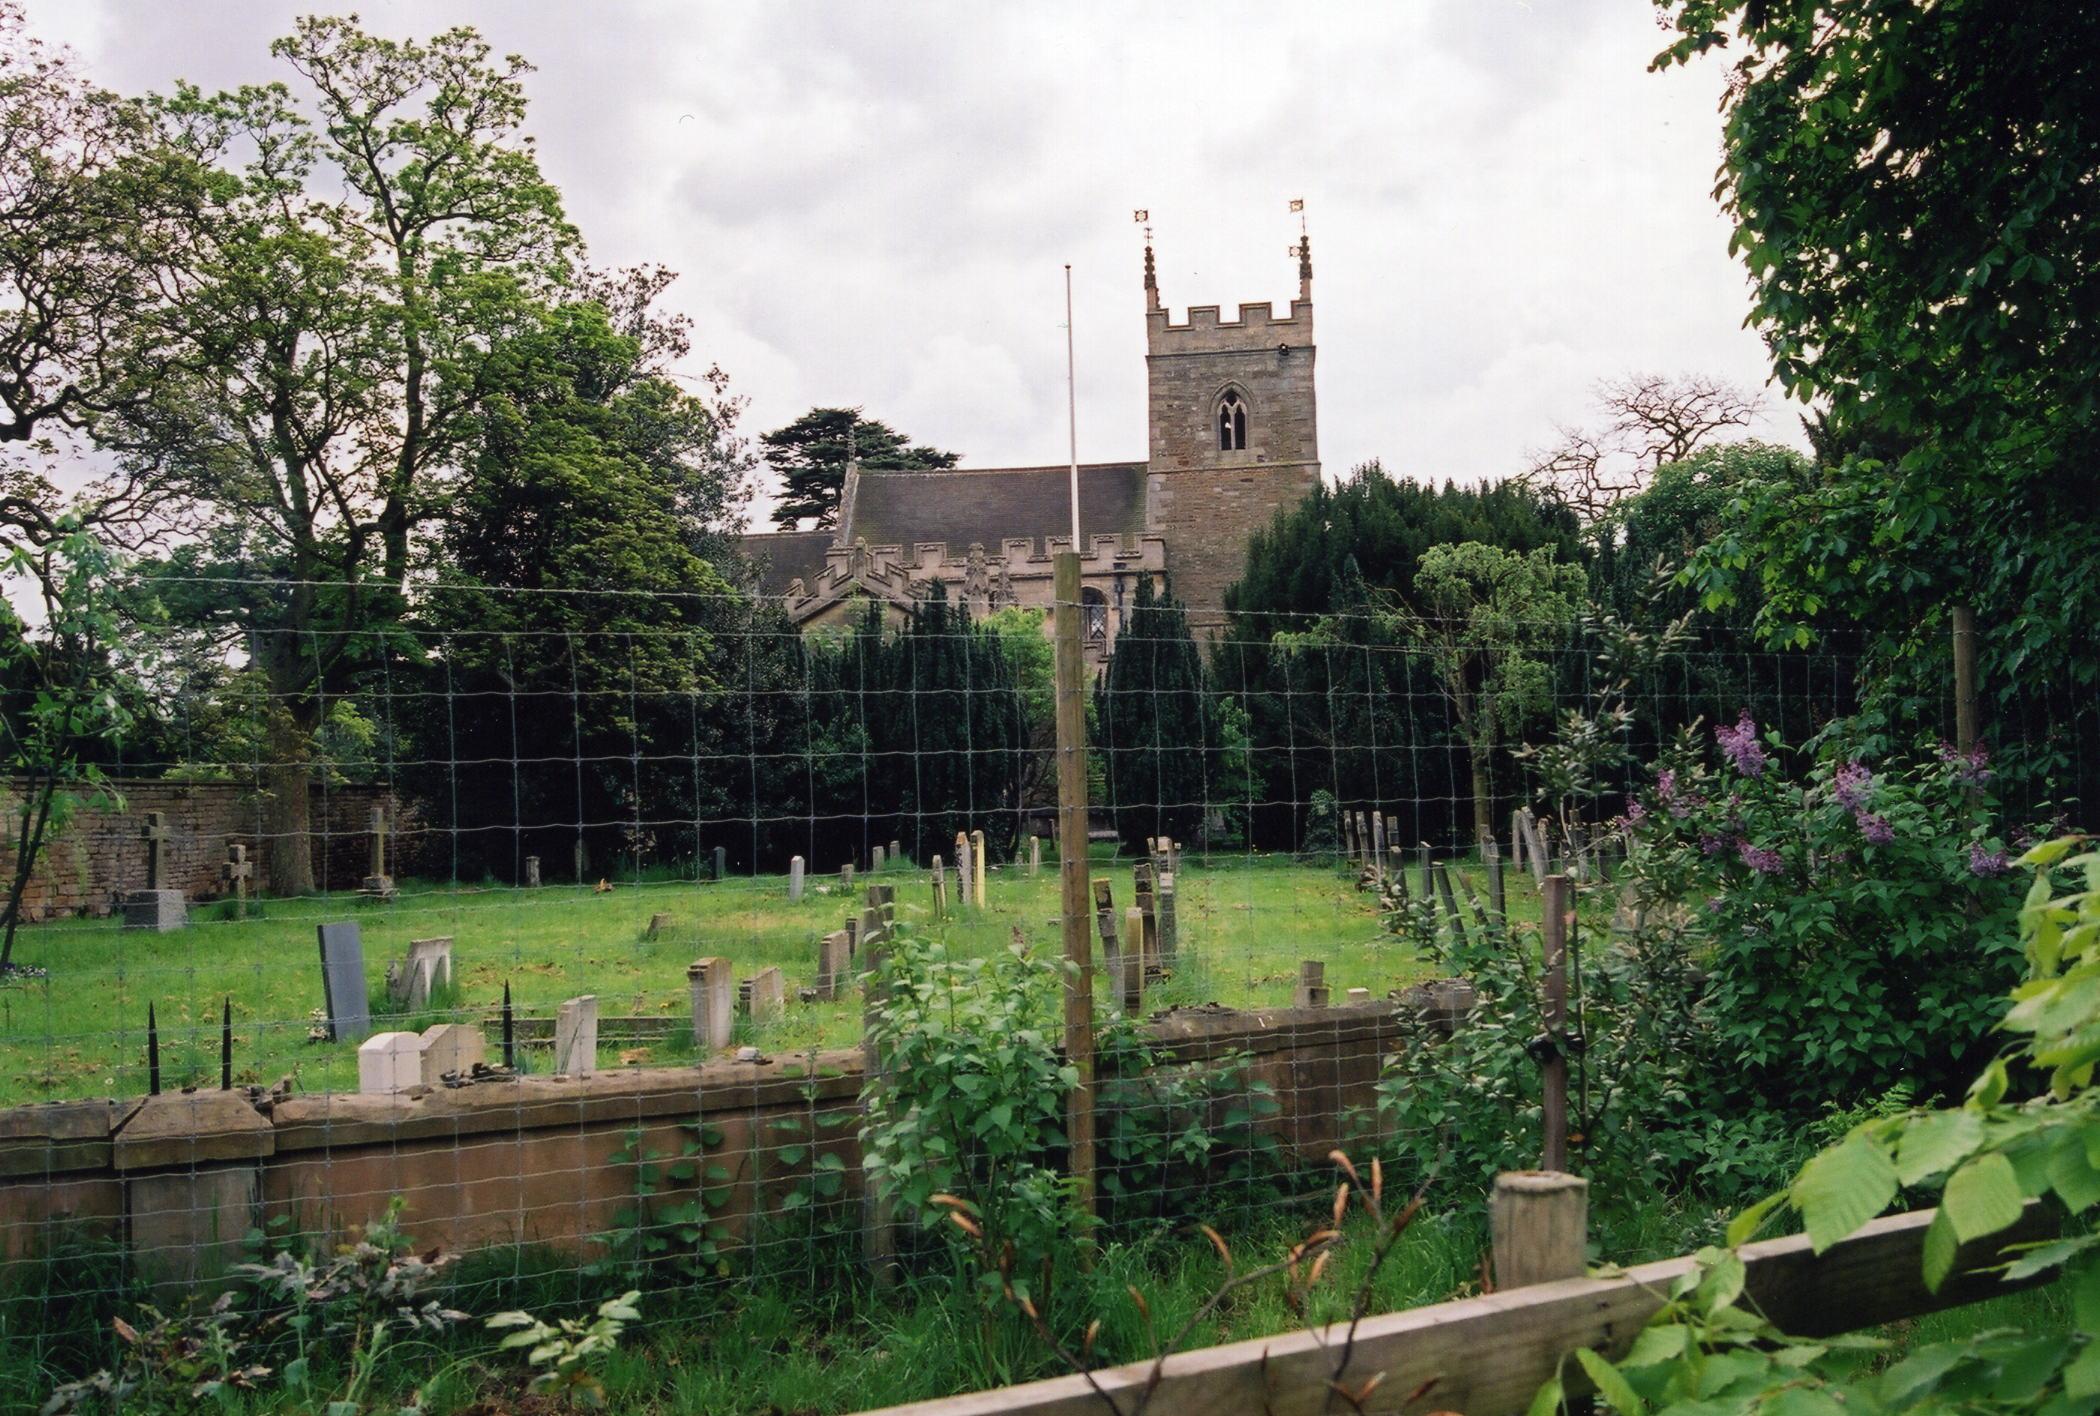 Belton Saint Peter parish church